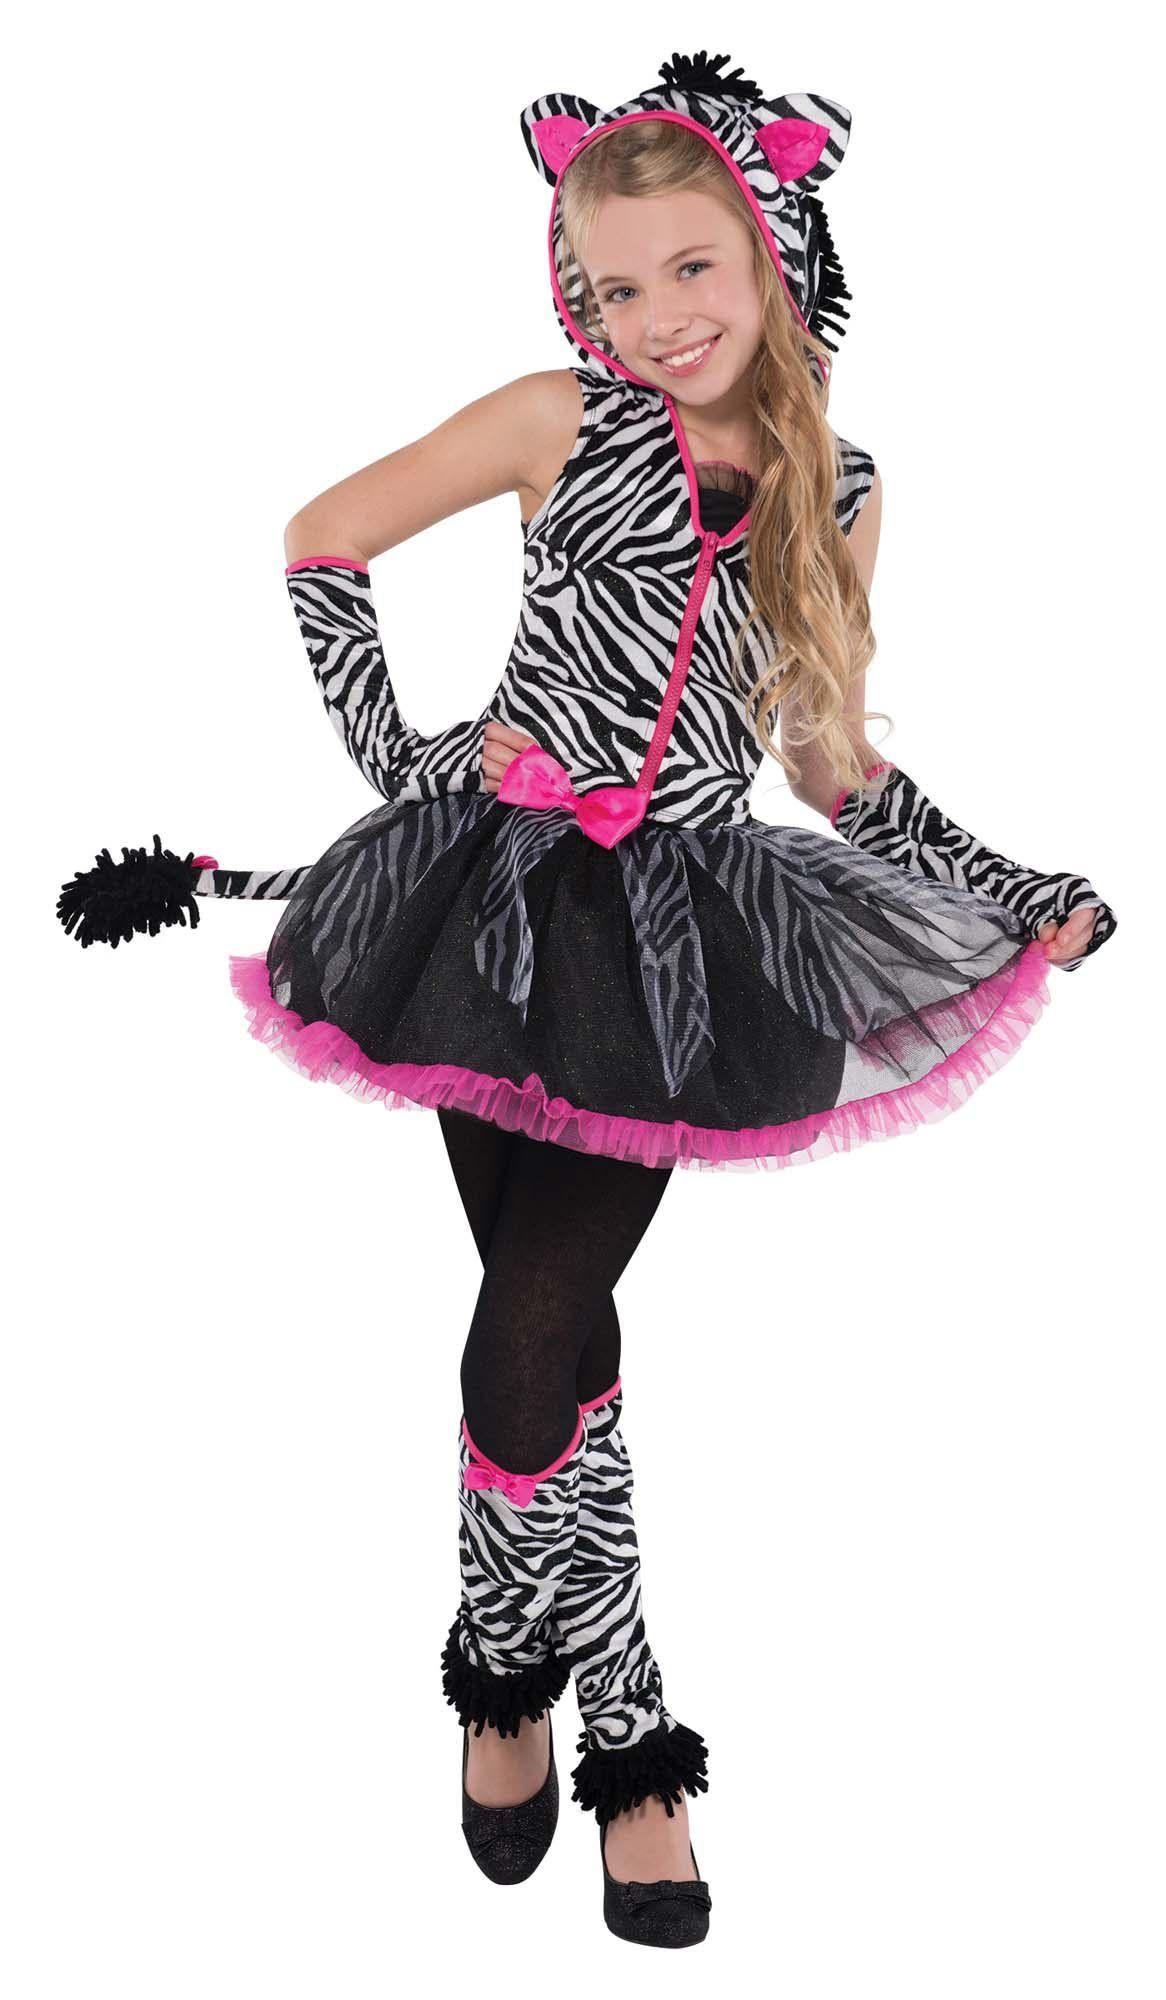 Sassy Stripes Zebra Costume for Halloween Party School